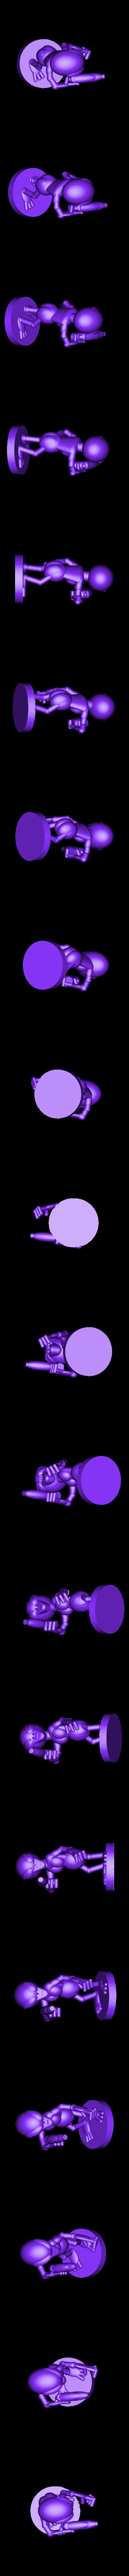 grey_pistb_1.stl Download free STL file The Grey Raid • Model to 3D print, Earsling